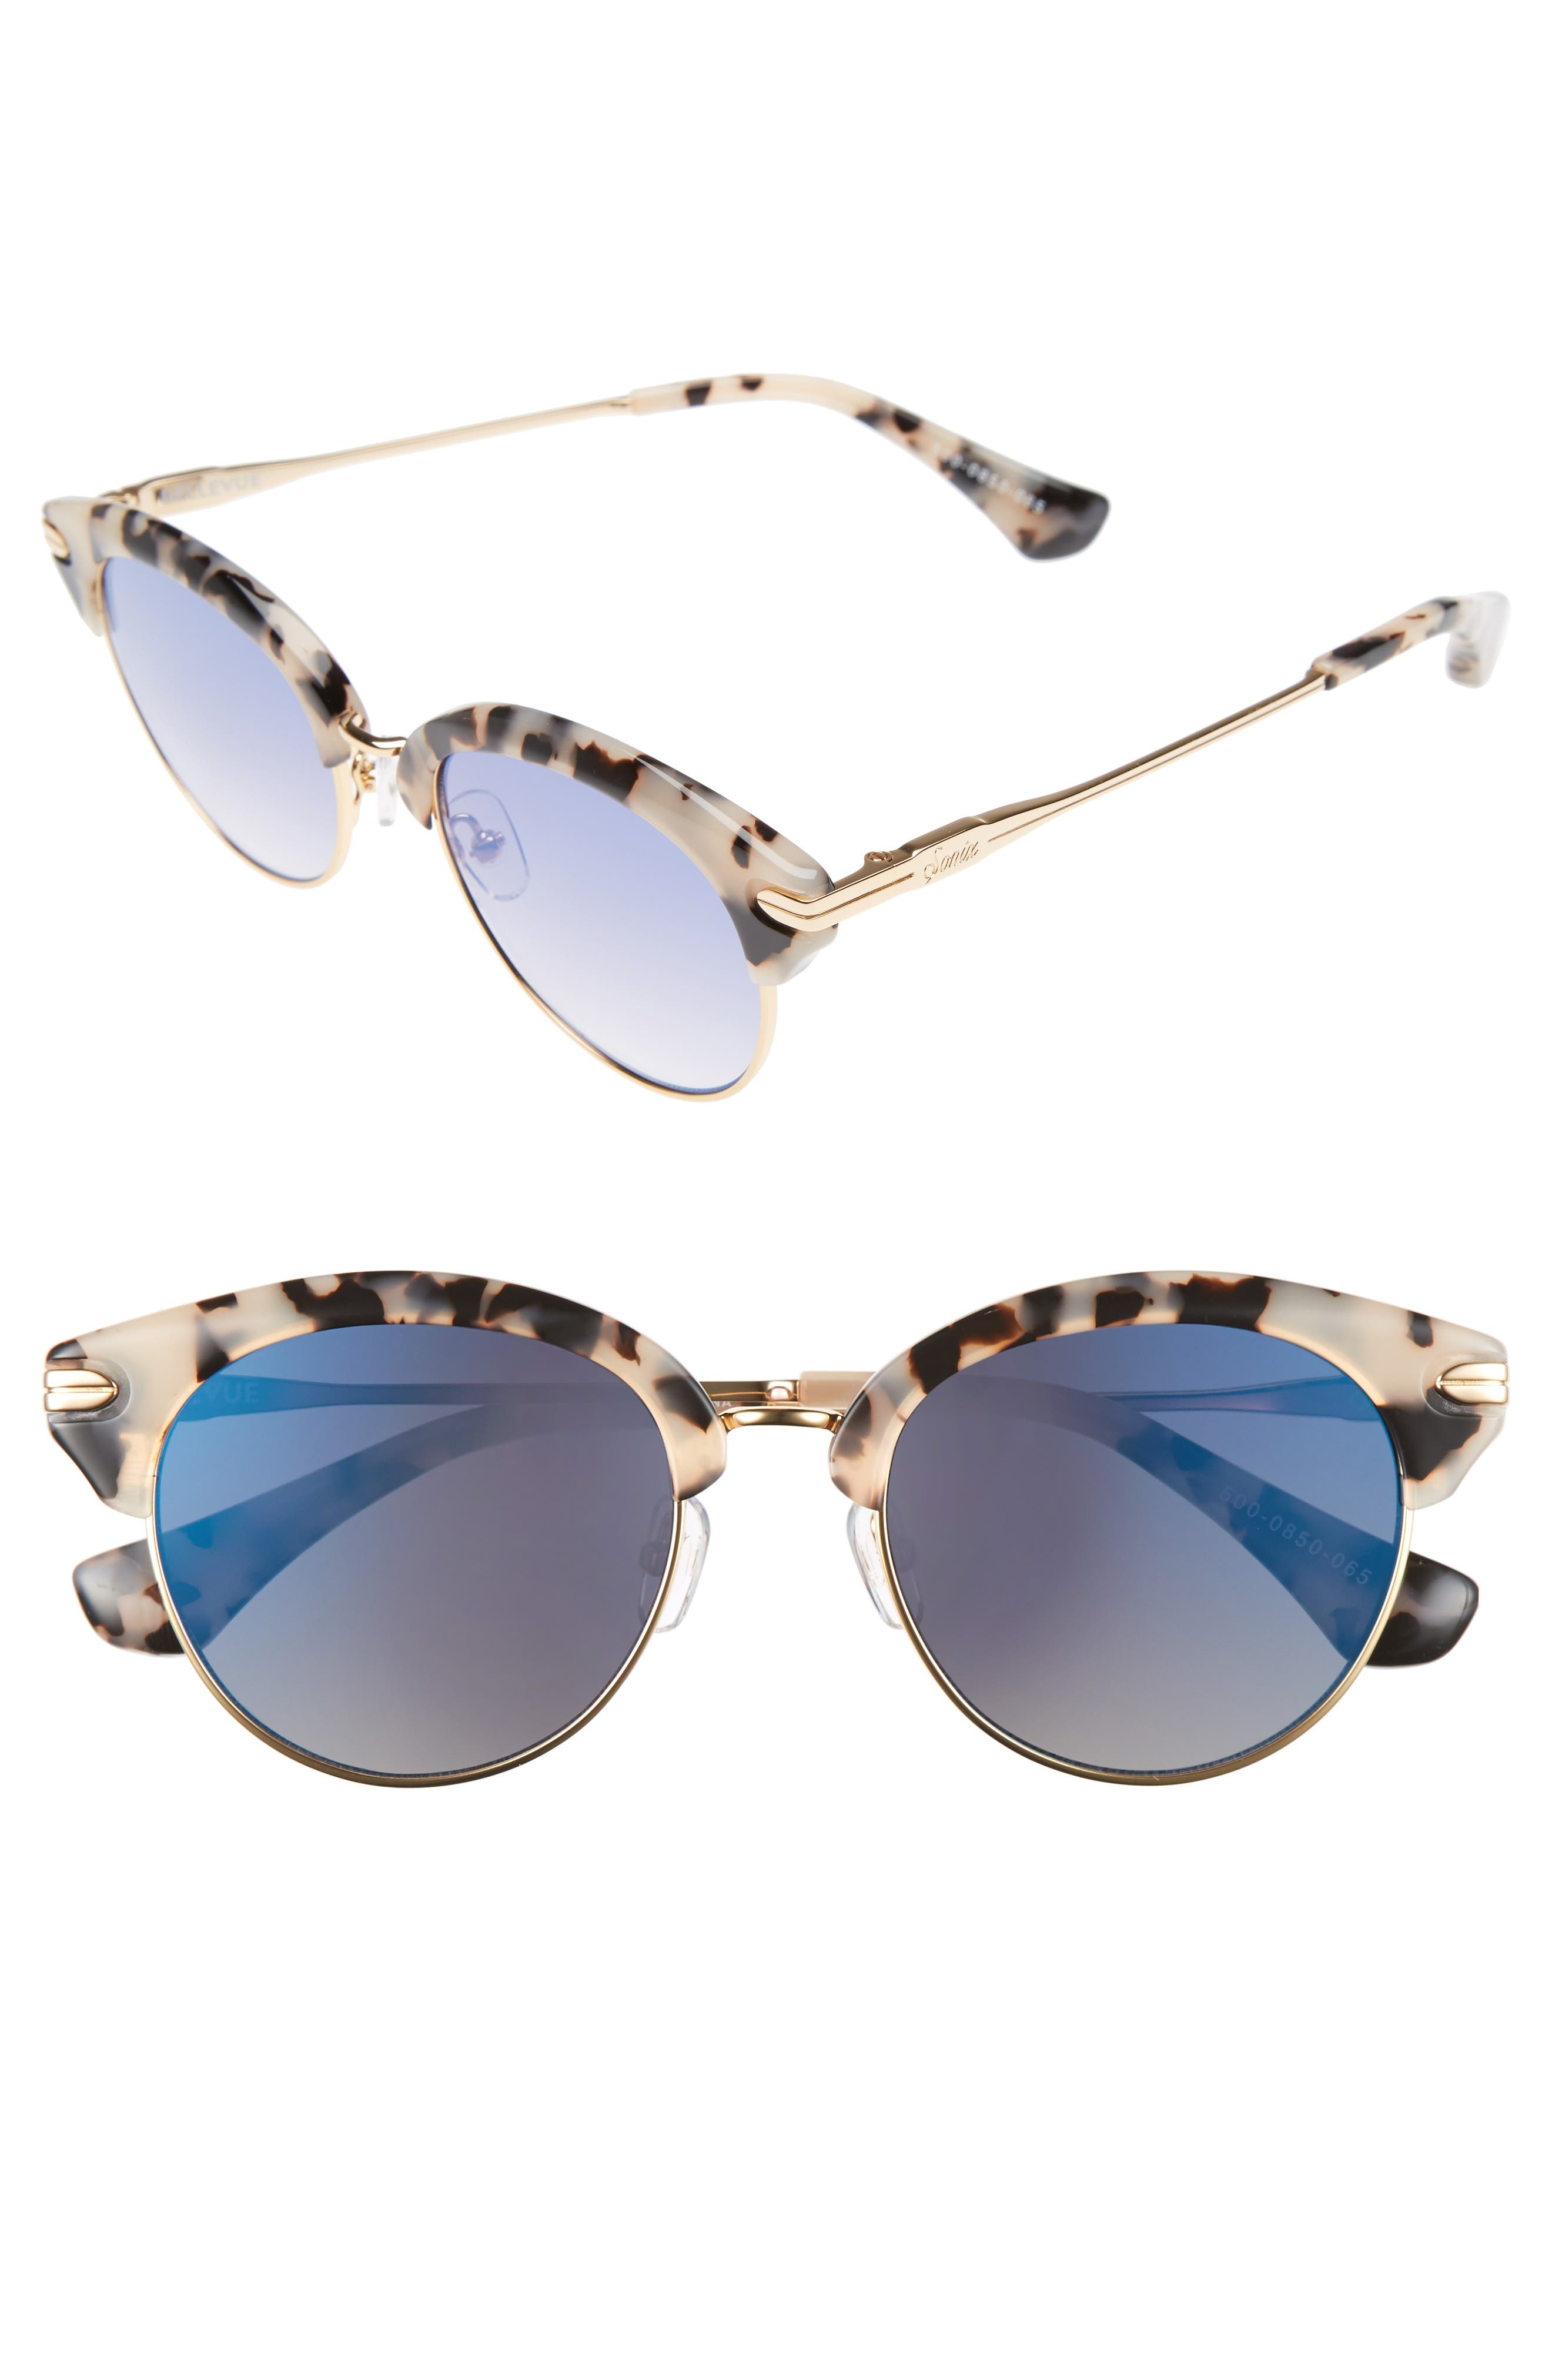 Sonix Bellevue 50mm Mirrored Sunglasses